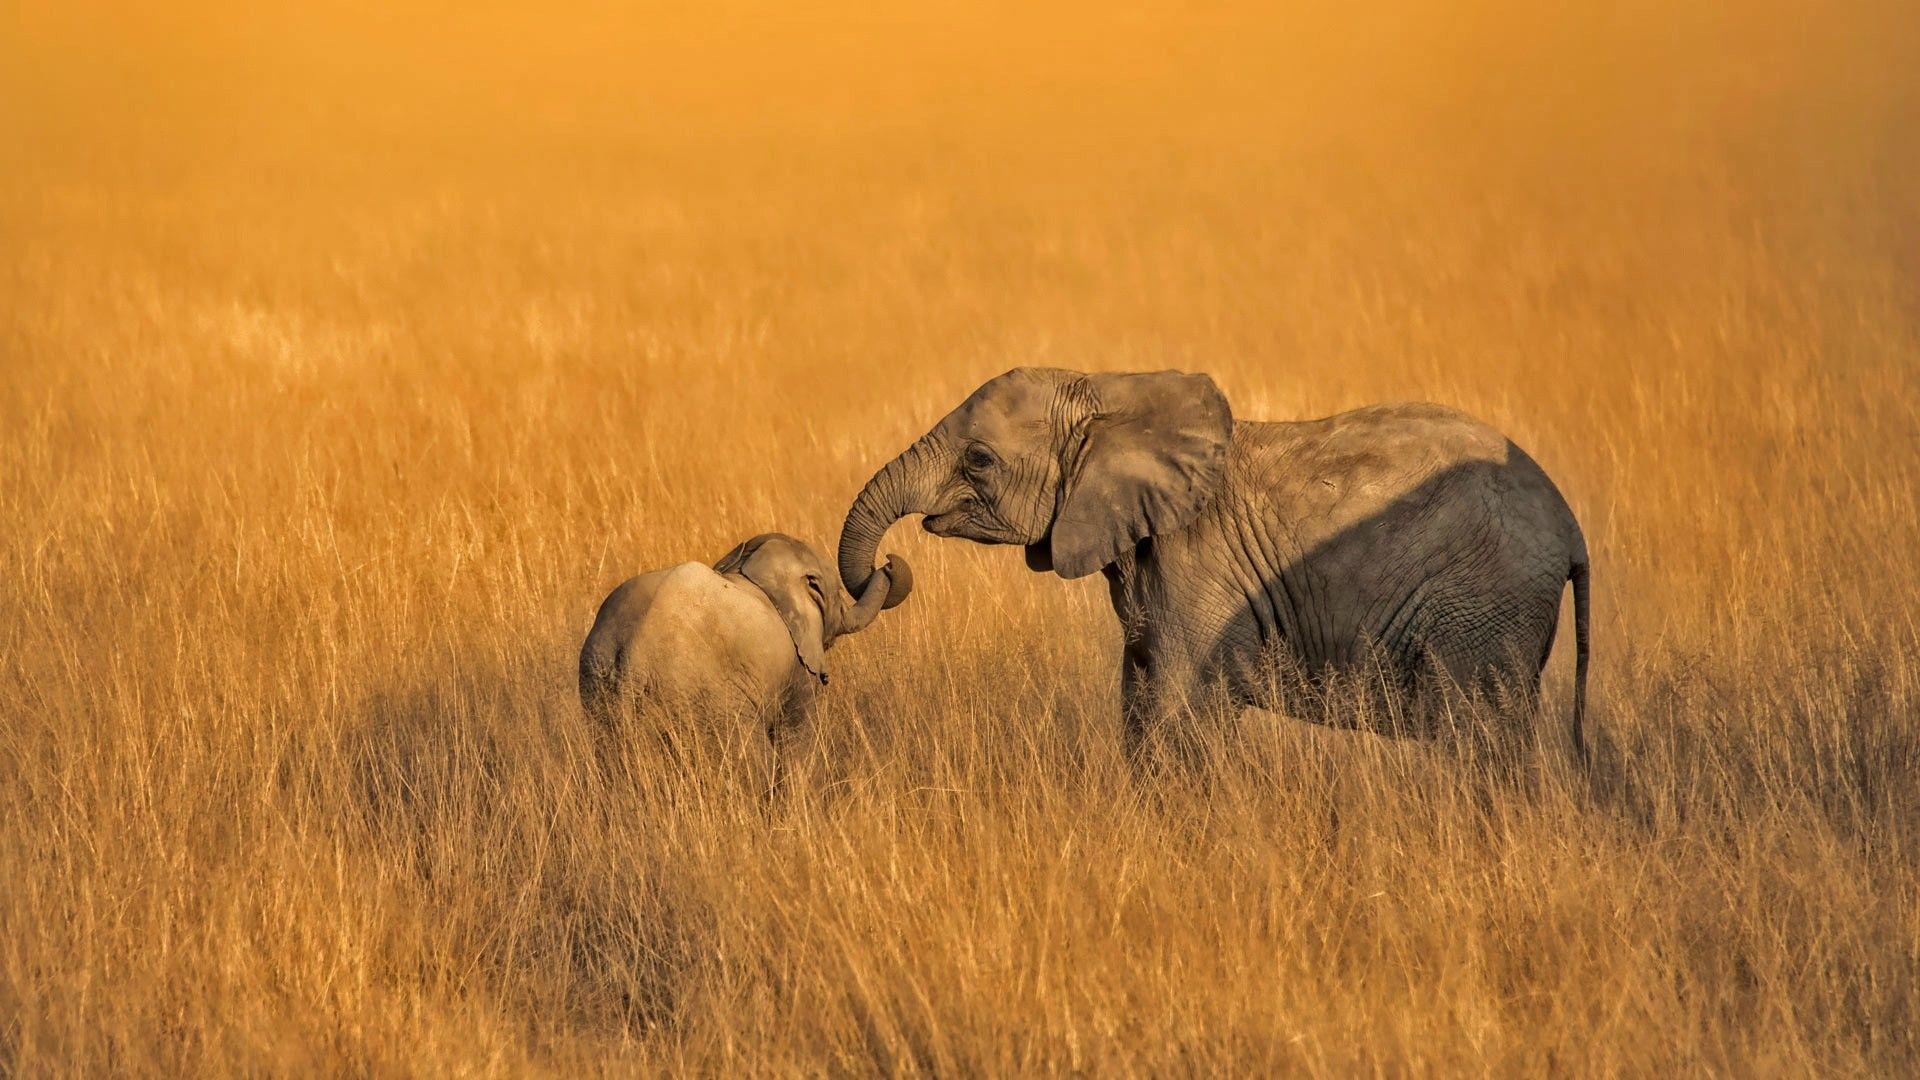 hd elephant wallpapers